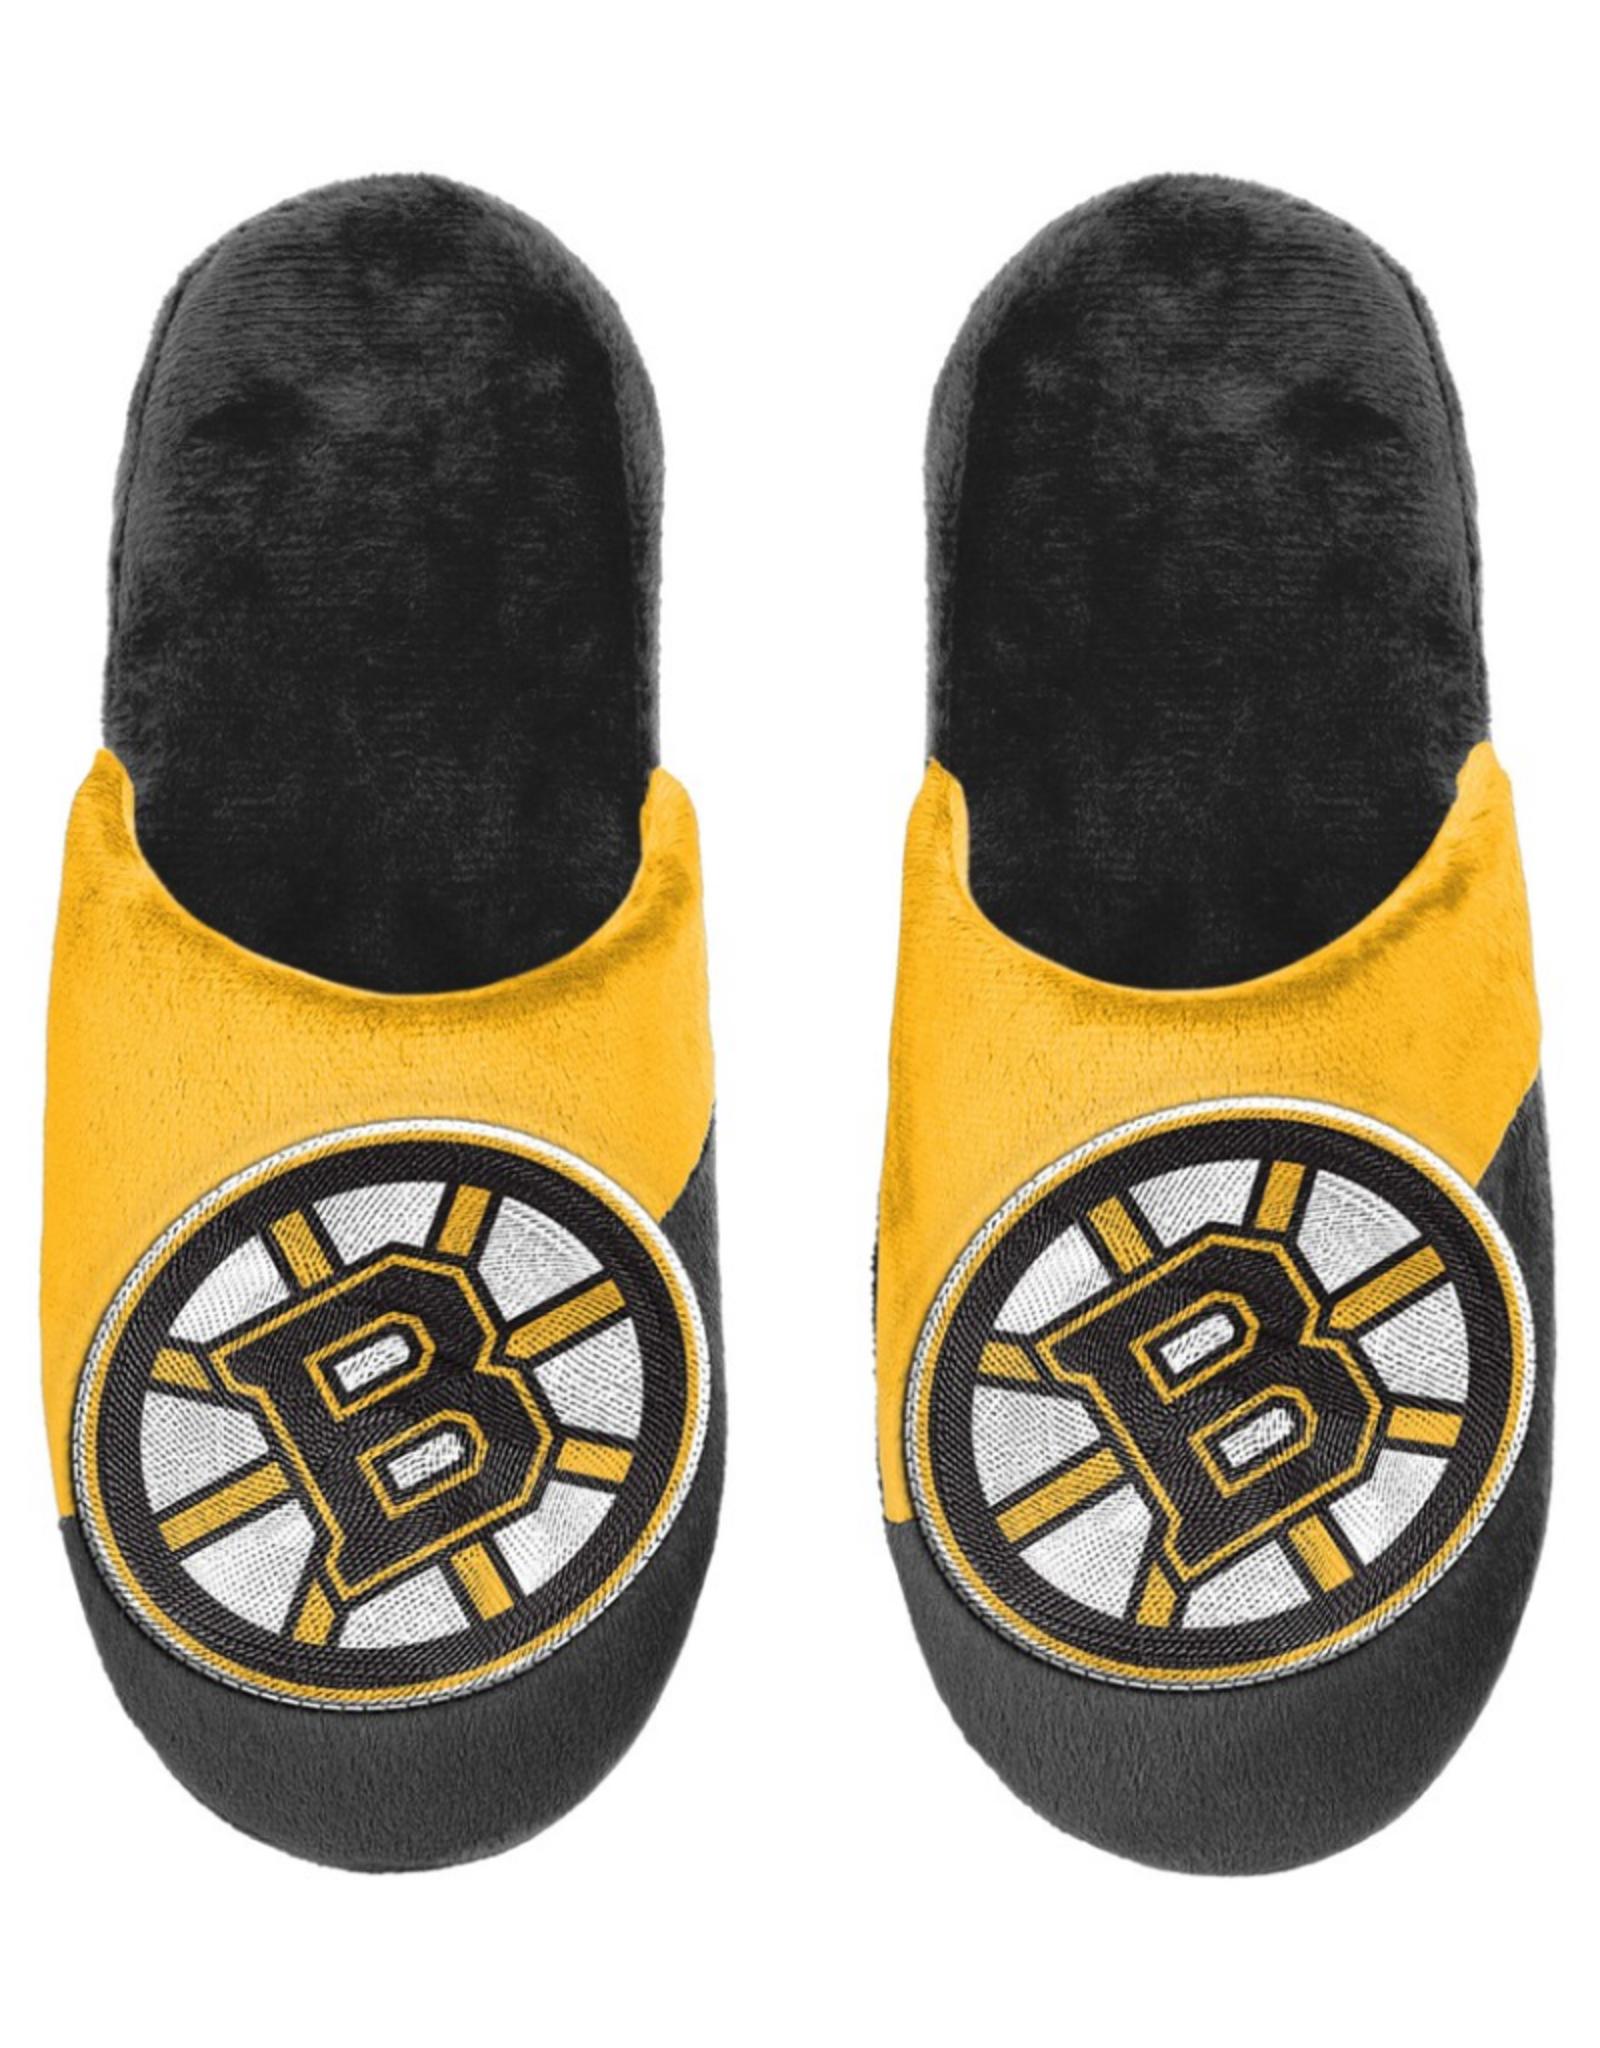 Forever Collectables FOCO Men's '20 Big Logo Slipper Boston Bruins